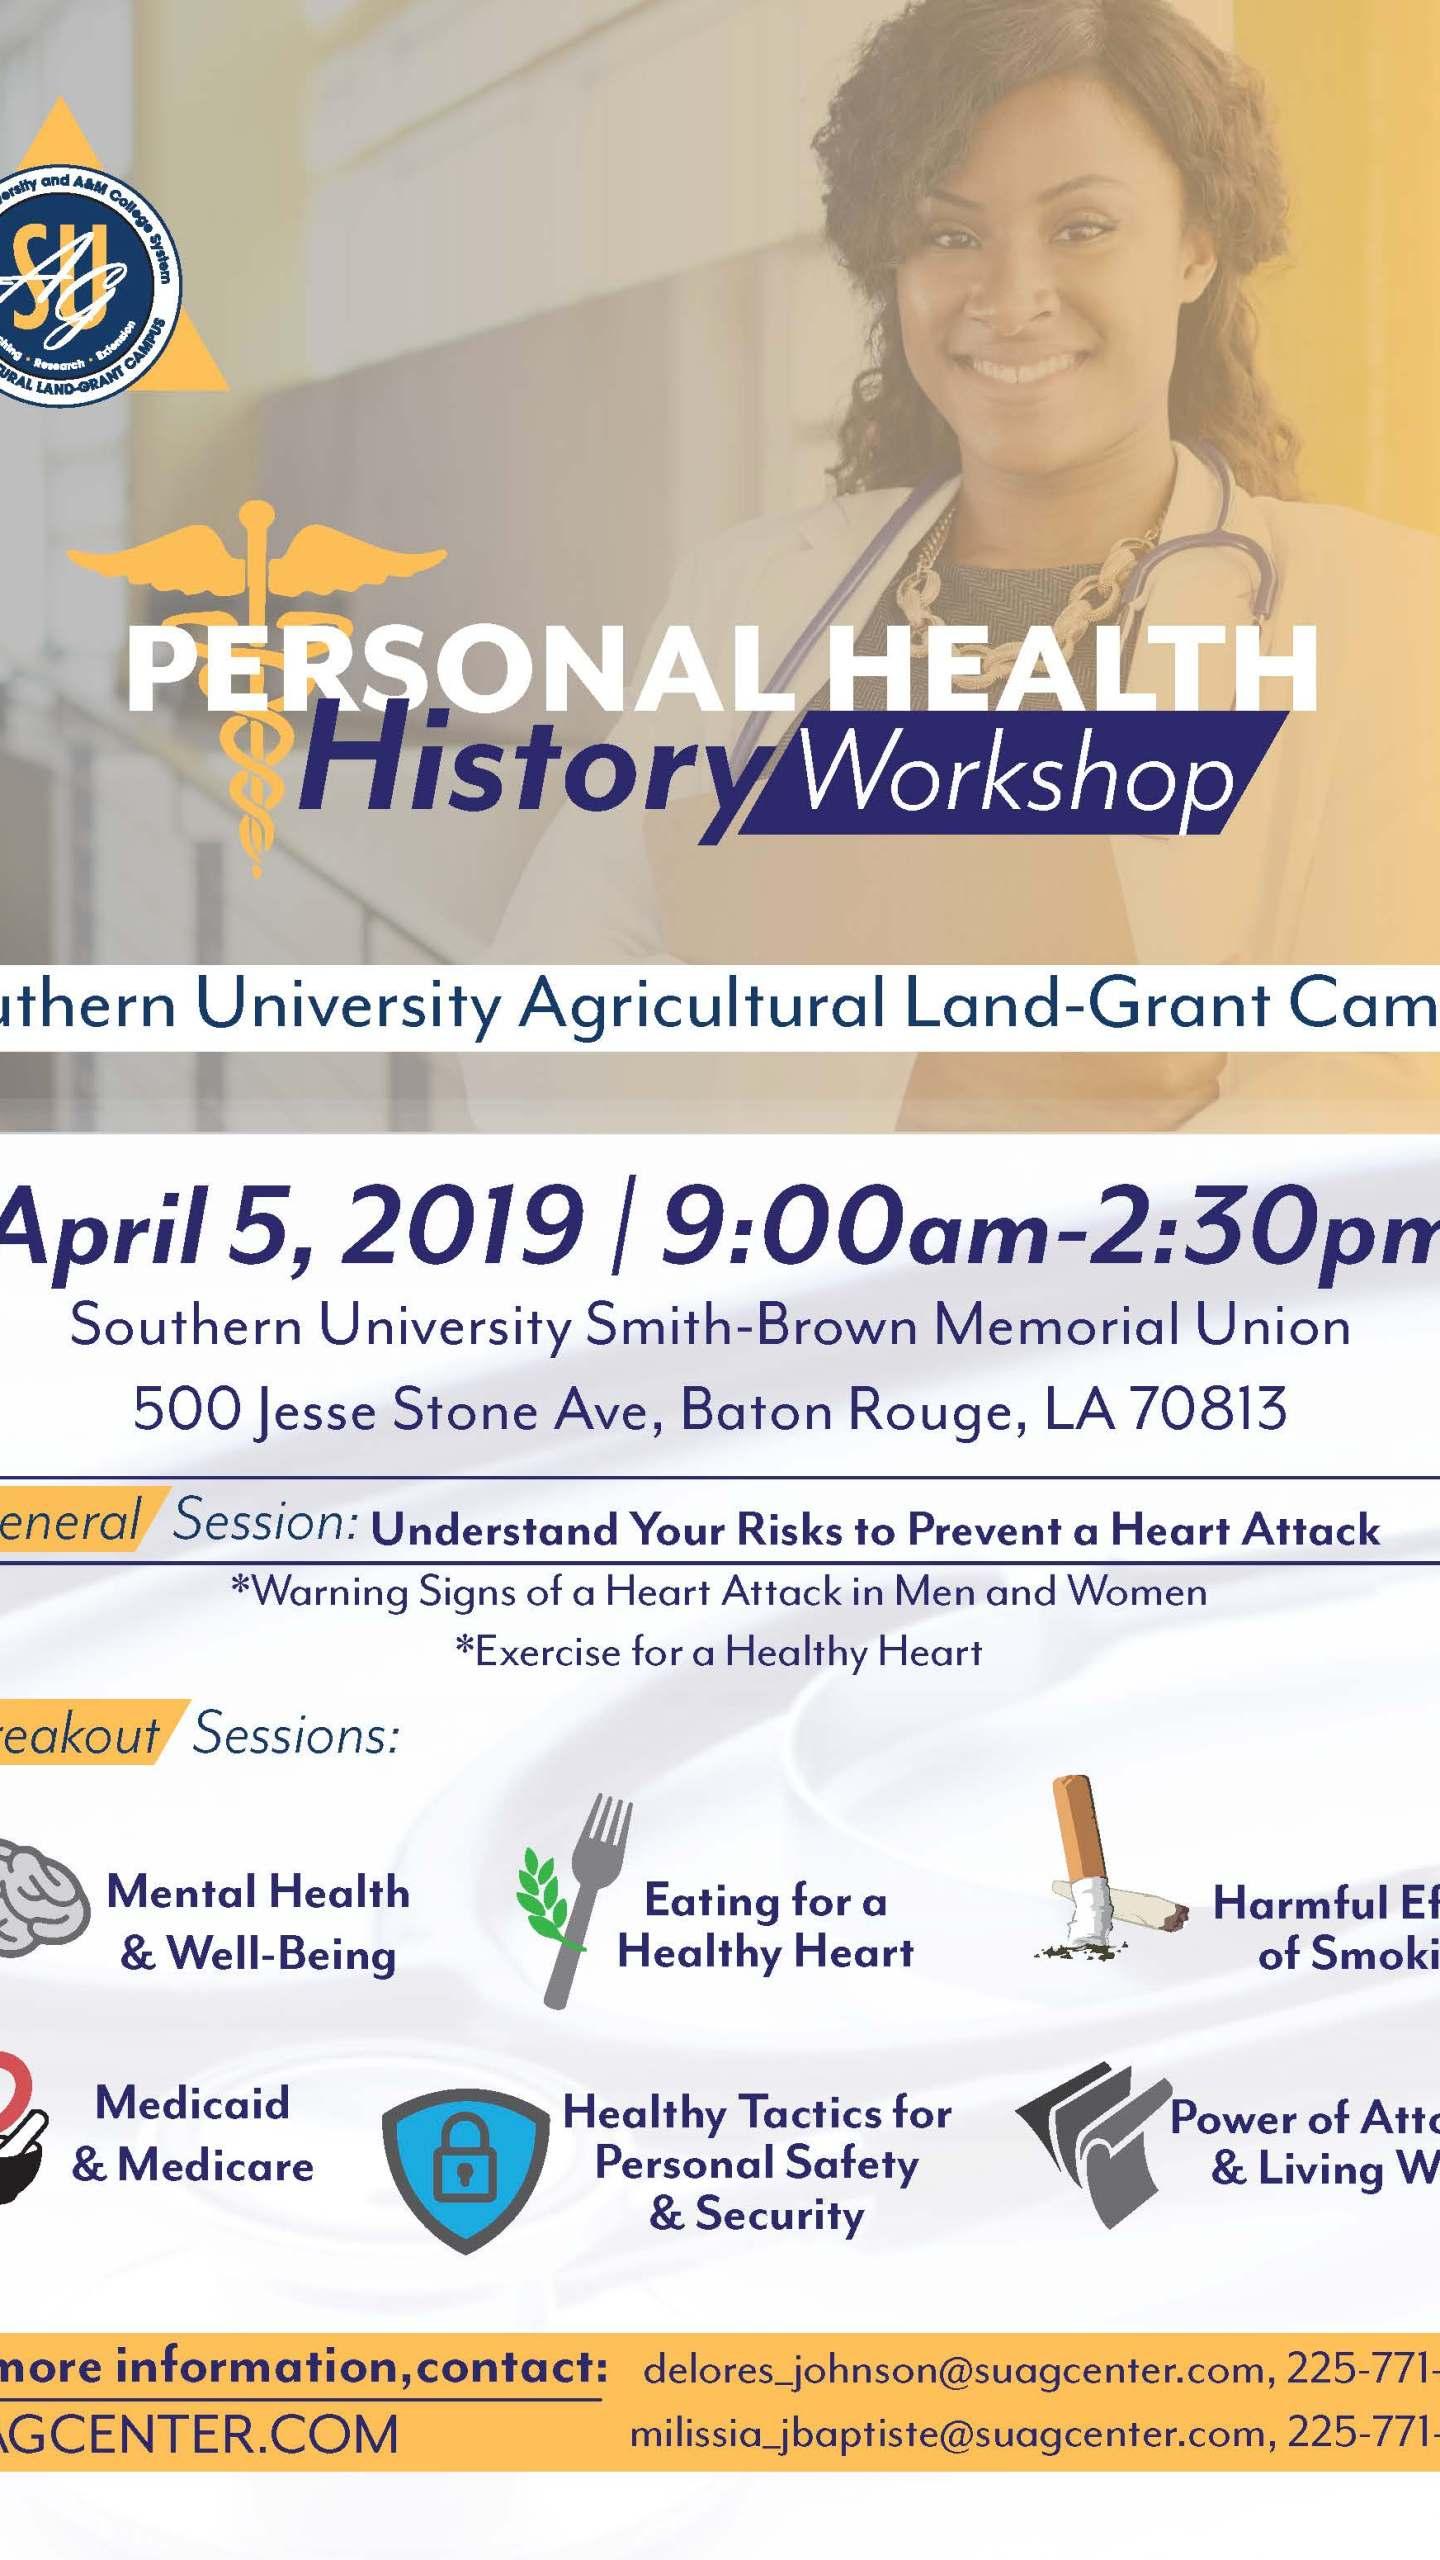 Personal Health History FLyer April 2019 (1)_1554405442461.jpg.jpg